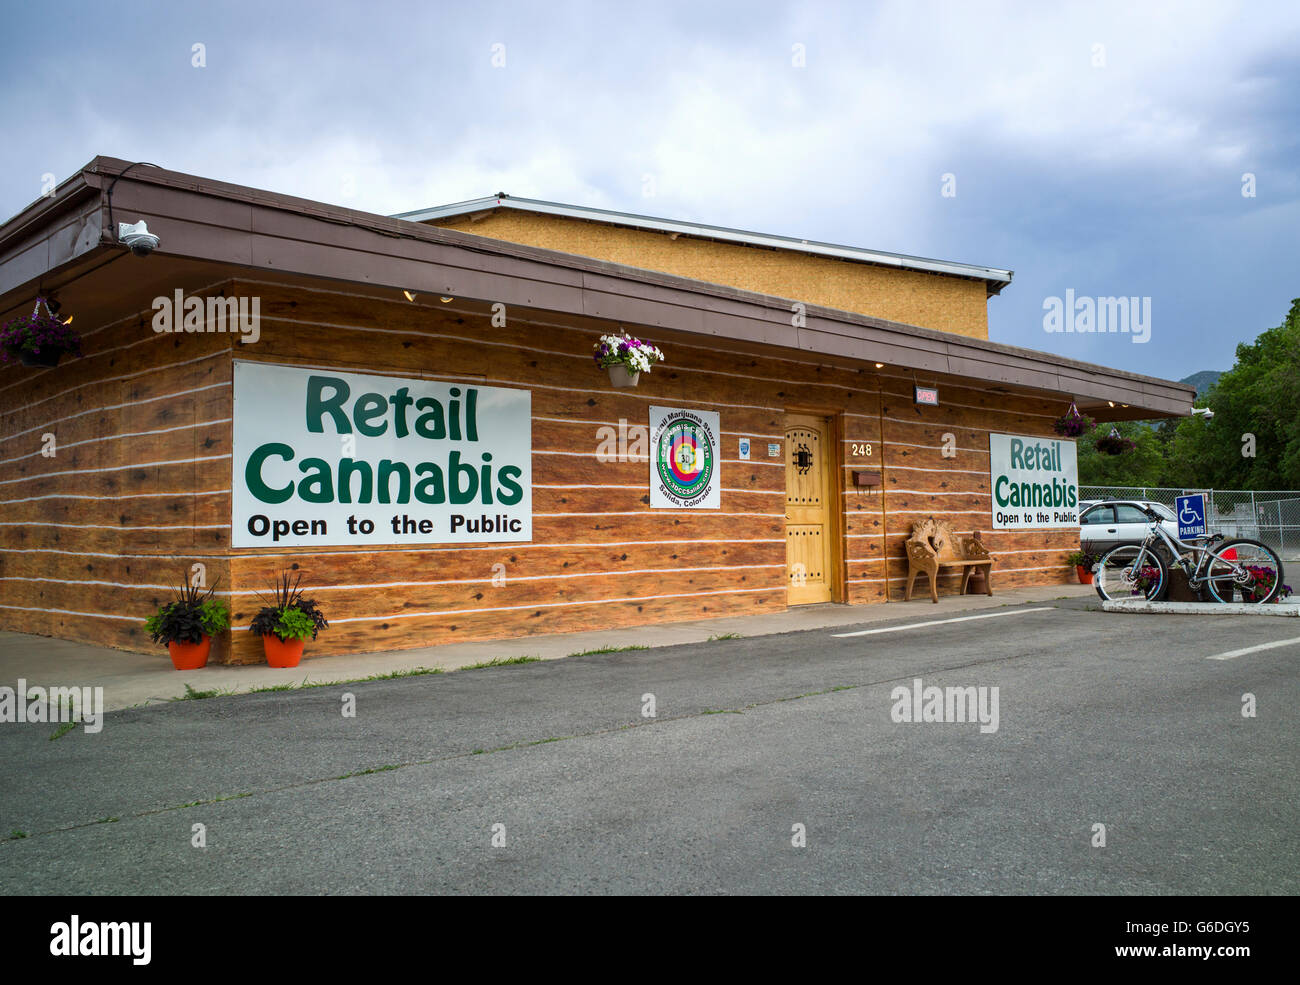 Retail Cannabis Marijuana store in Central Colorado; USA - Stock Image